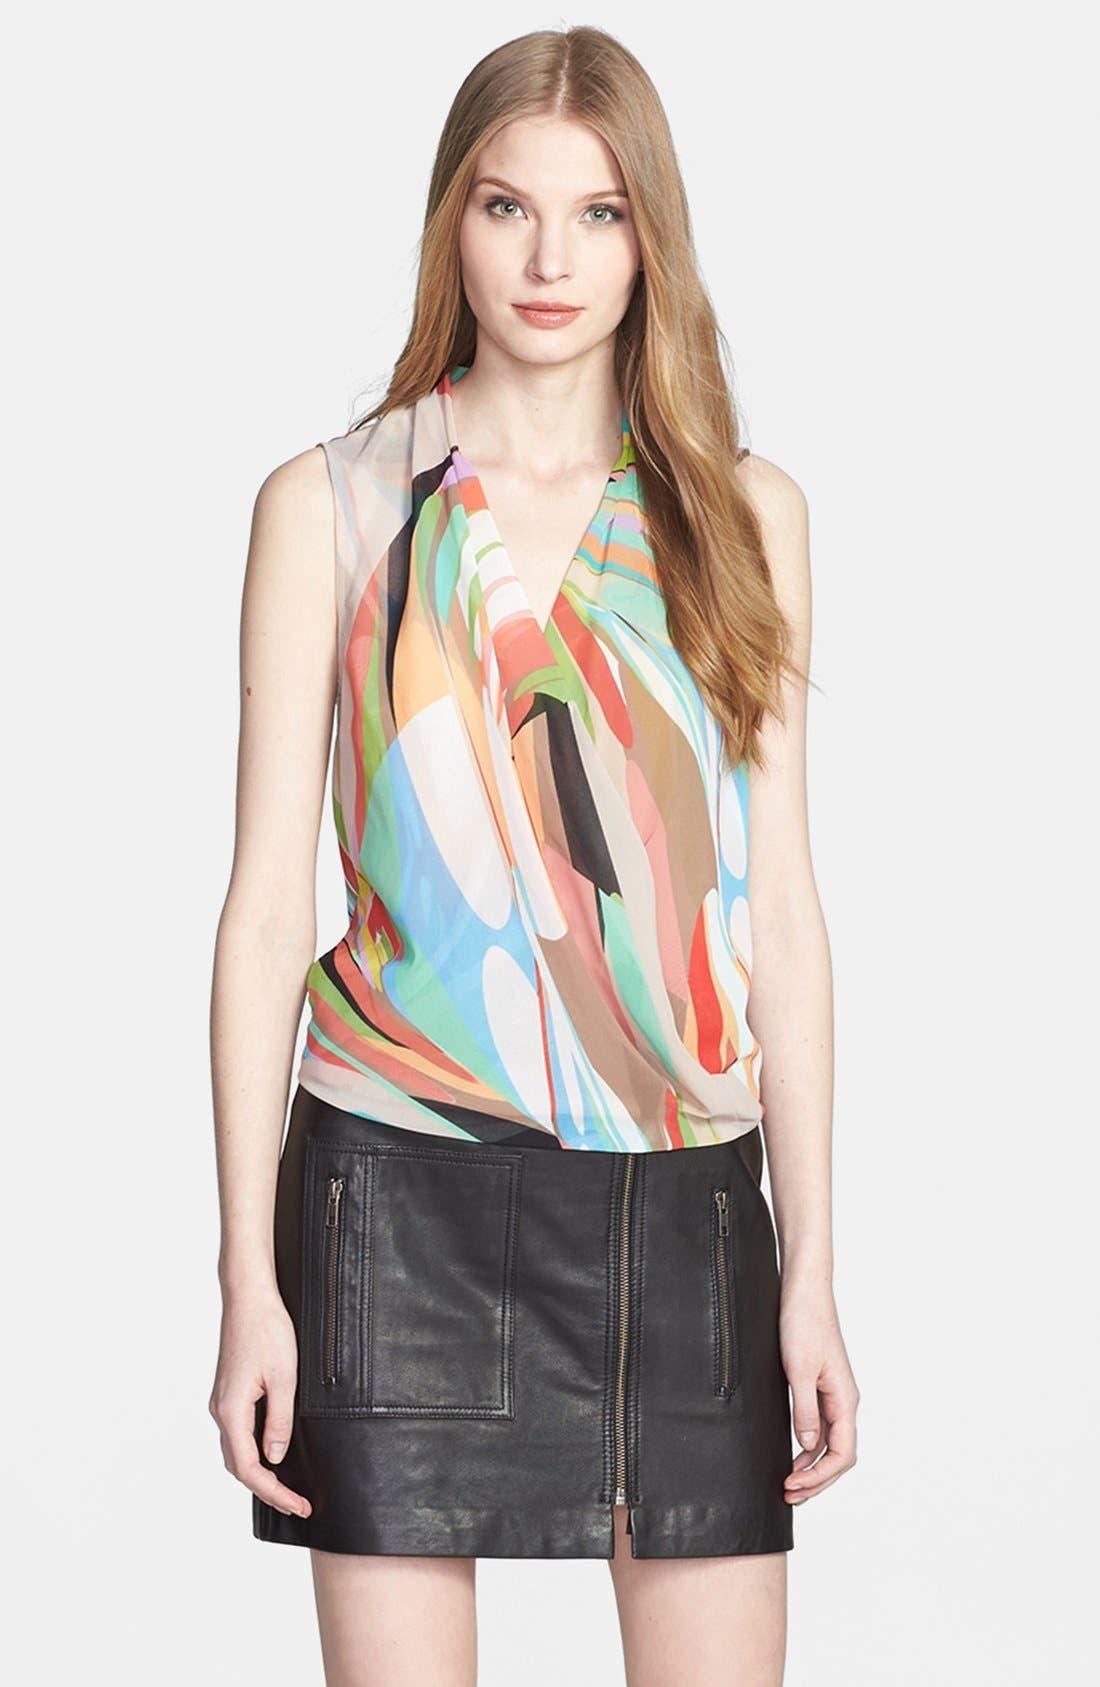 Alternate Image 1 Selected - Trina Turk 'Muriel' Print Drape Top